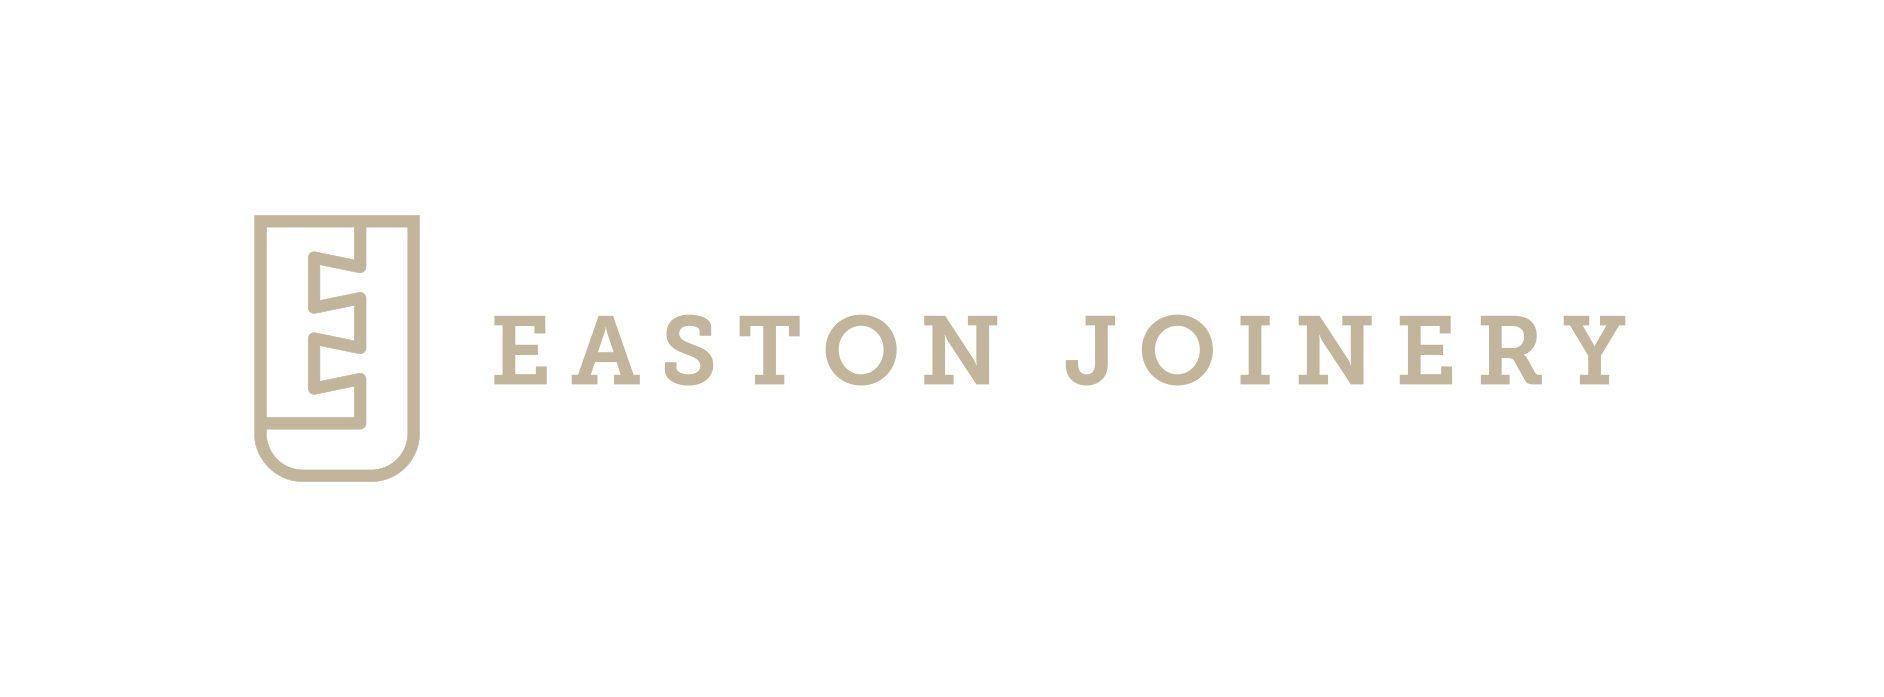 Easton Joinery LTD